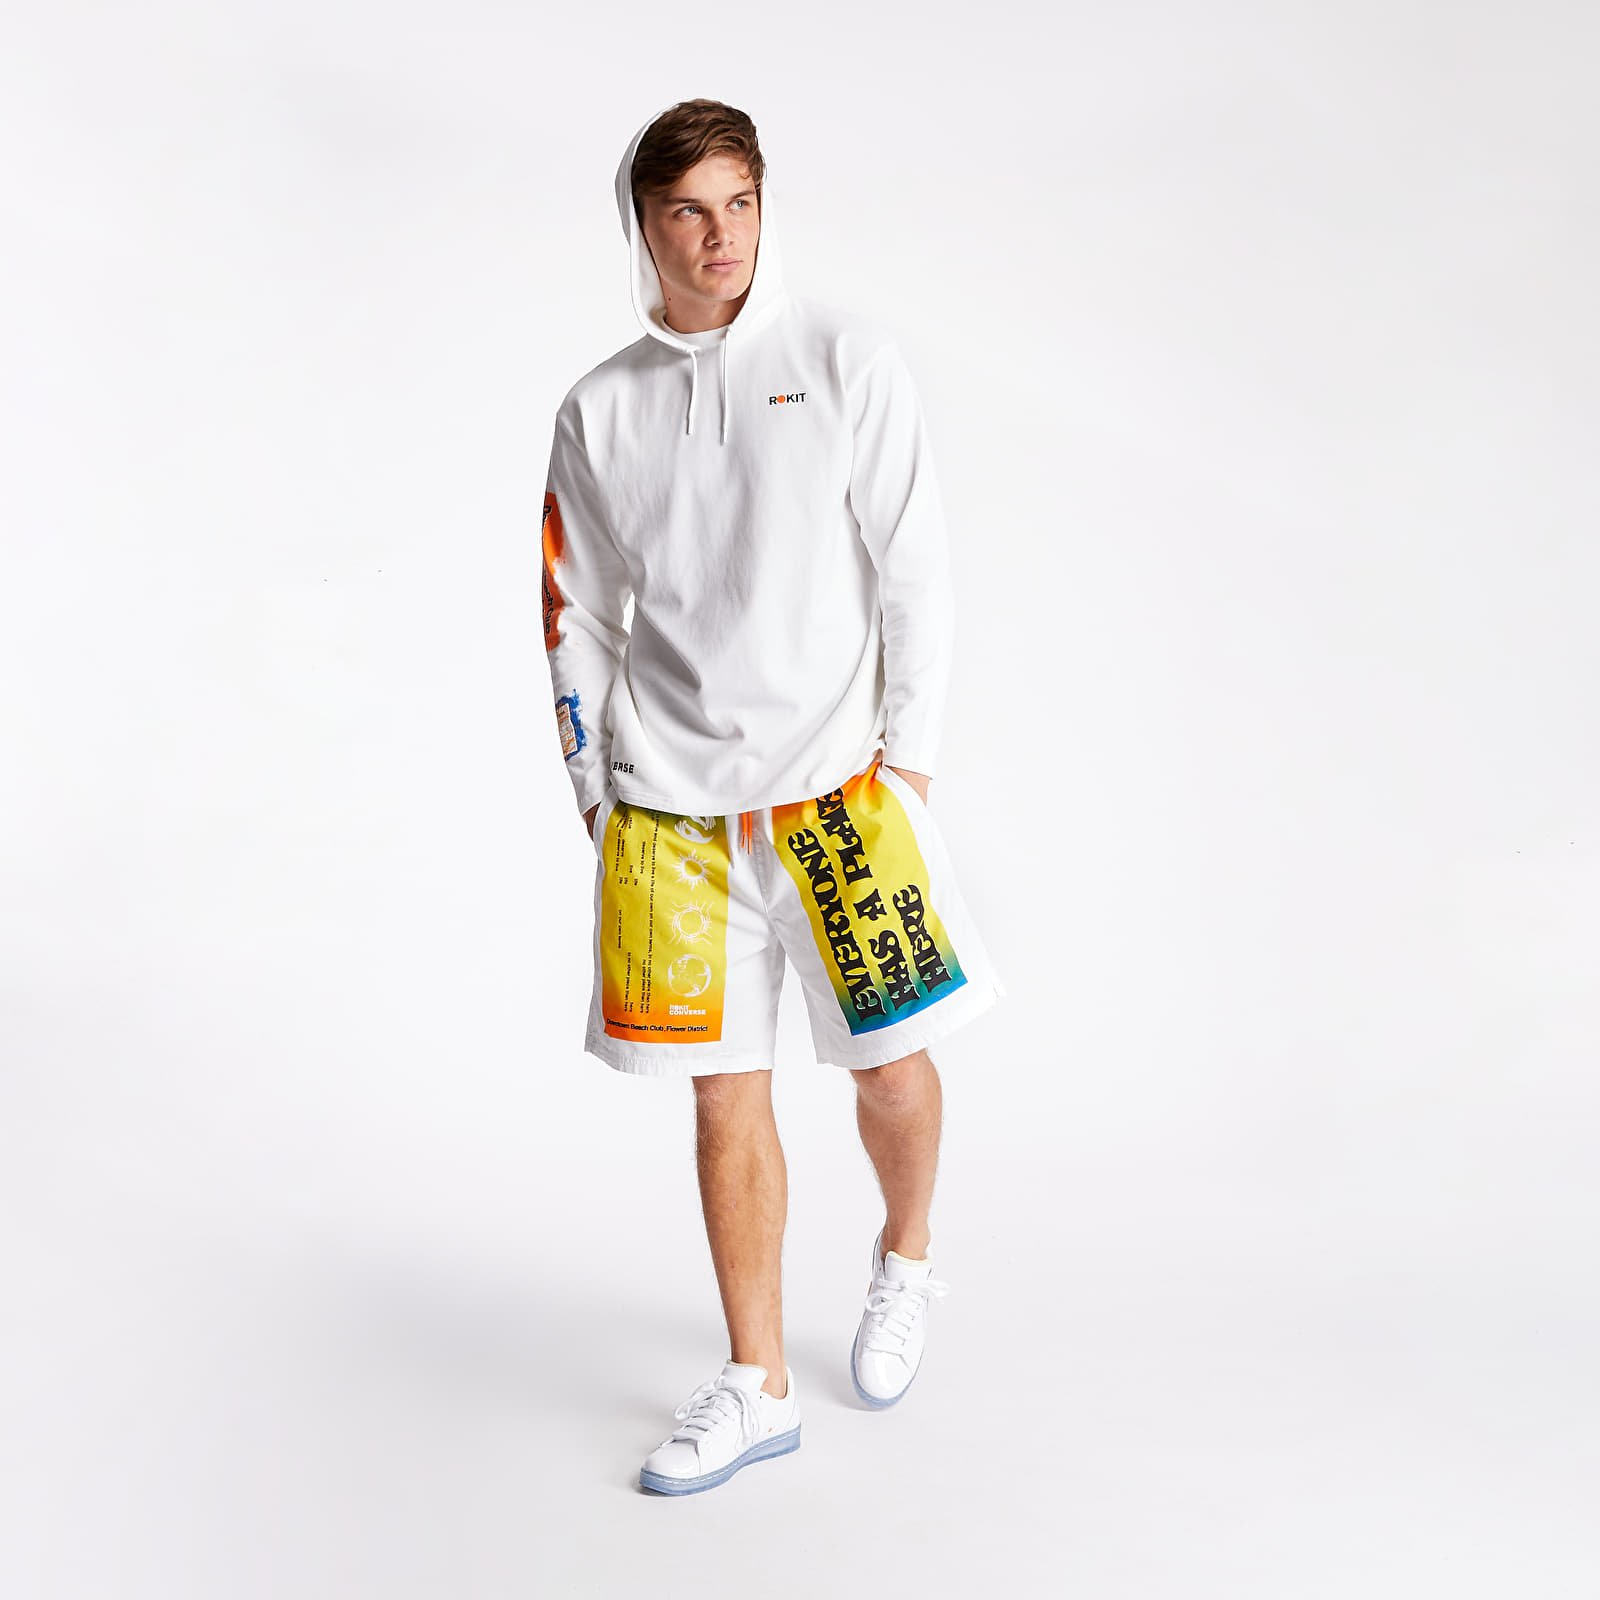 Shorts Converse x Rokit Shorts White